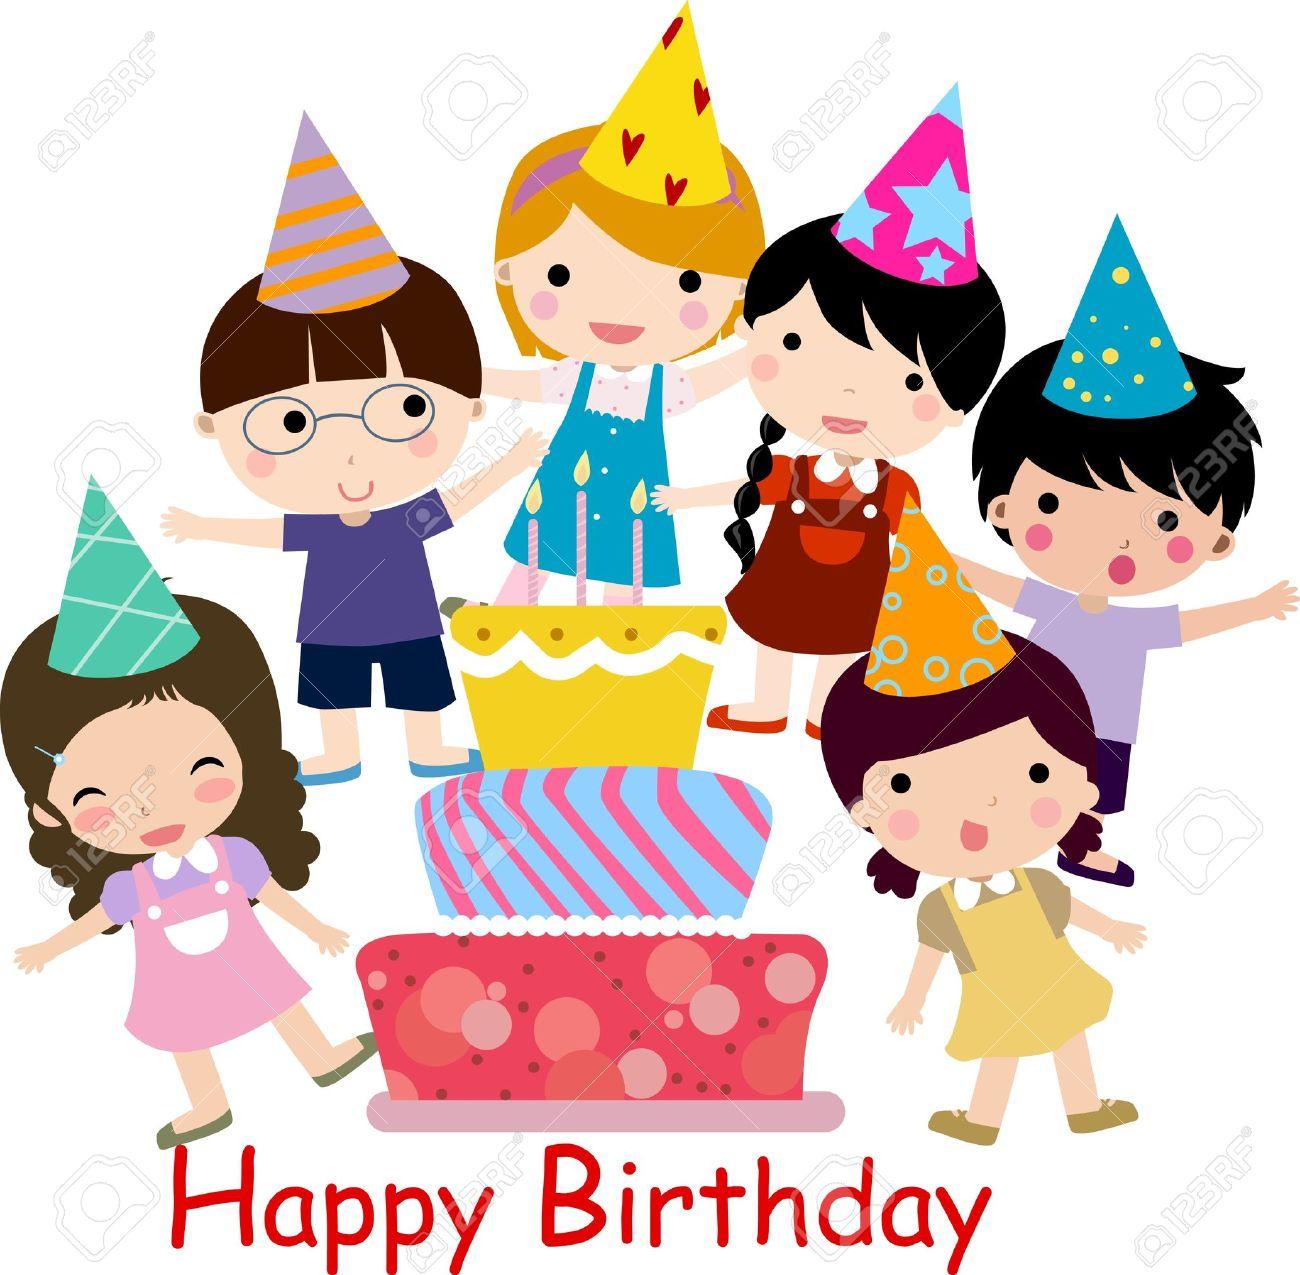 1300x1275 Birthday Celebration Royalty Free Cliparts, Vectors, And Stock